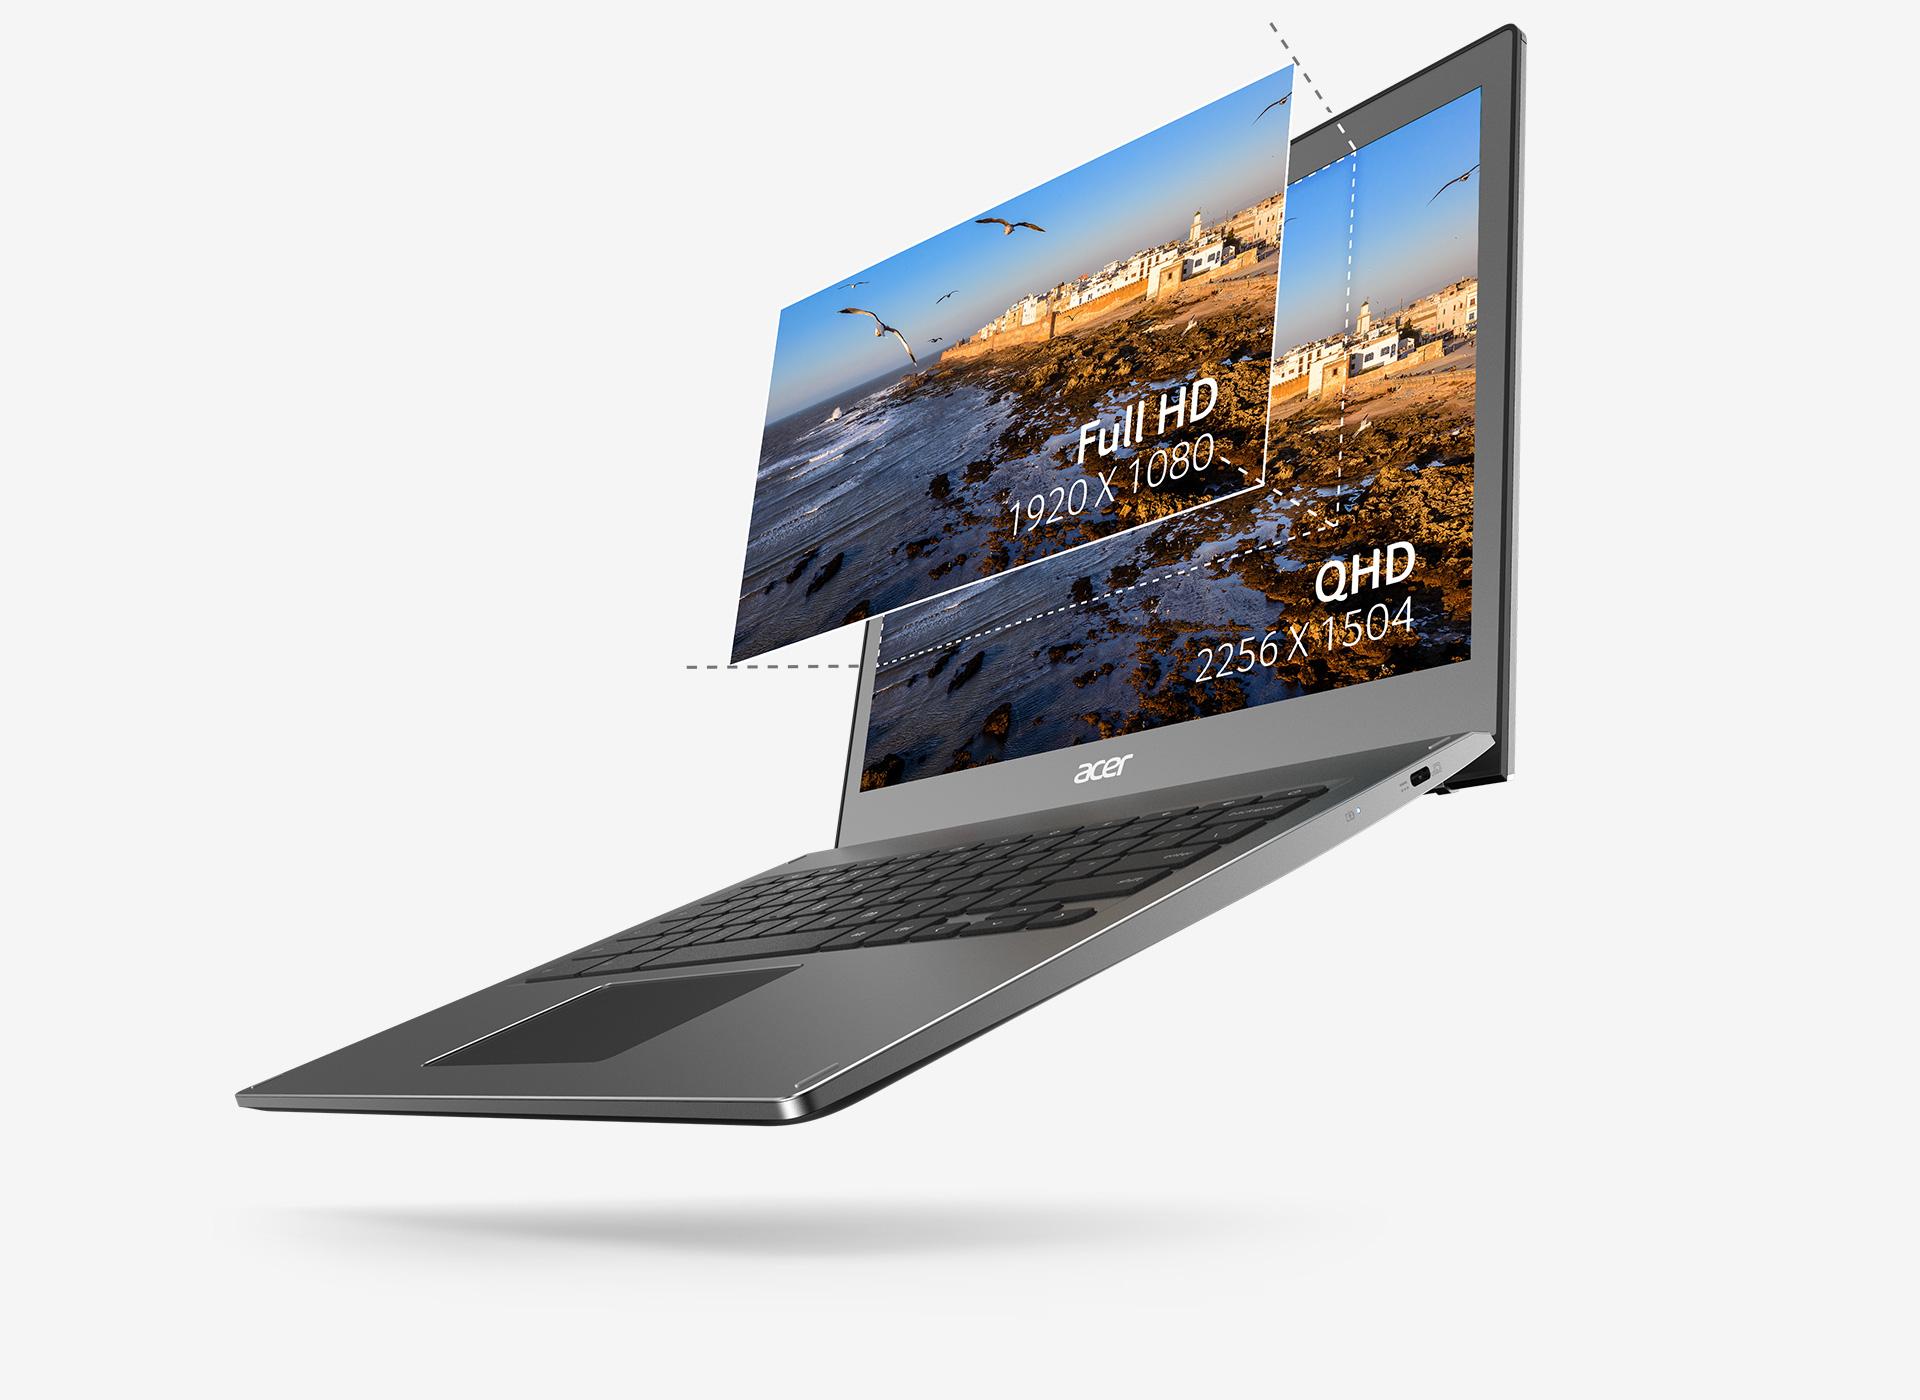 Acer Chromebook 13 - CB713 - Sharp Images - Large